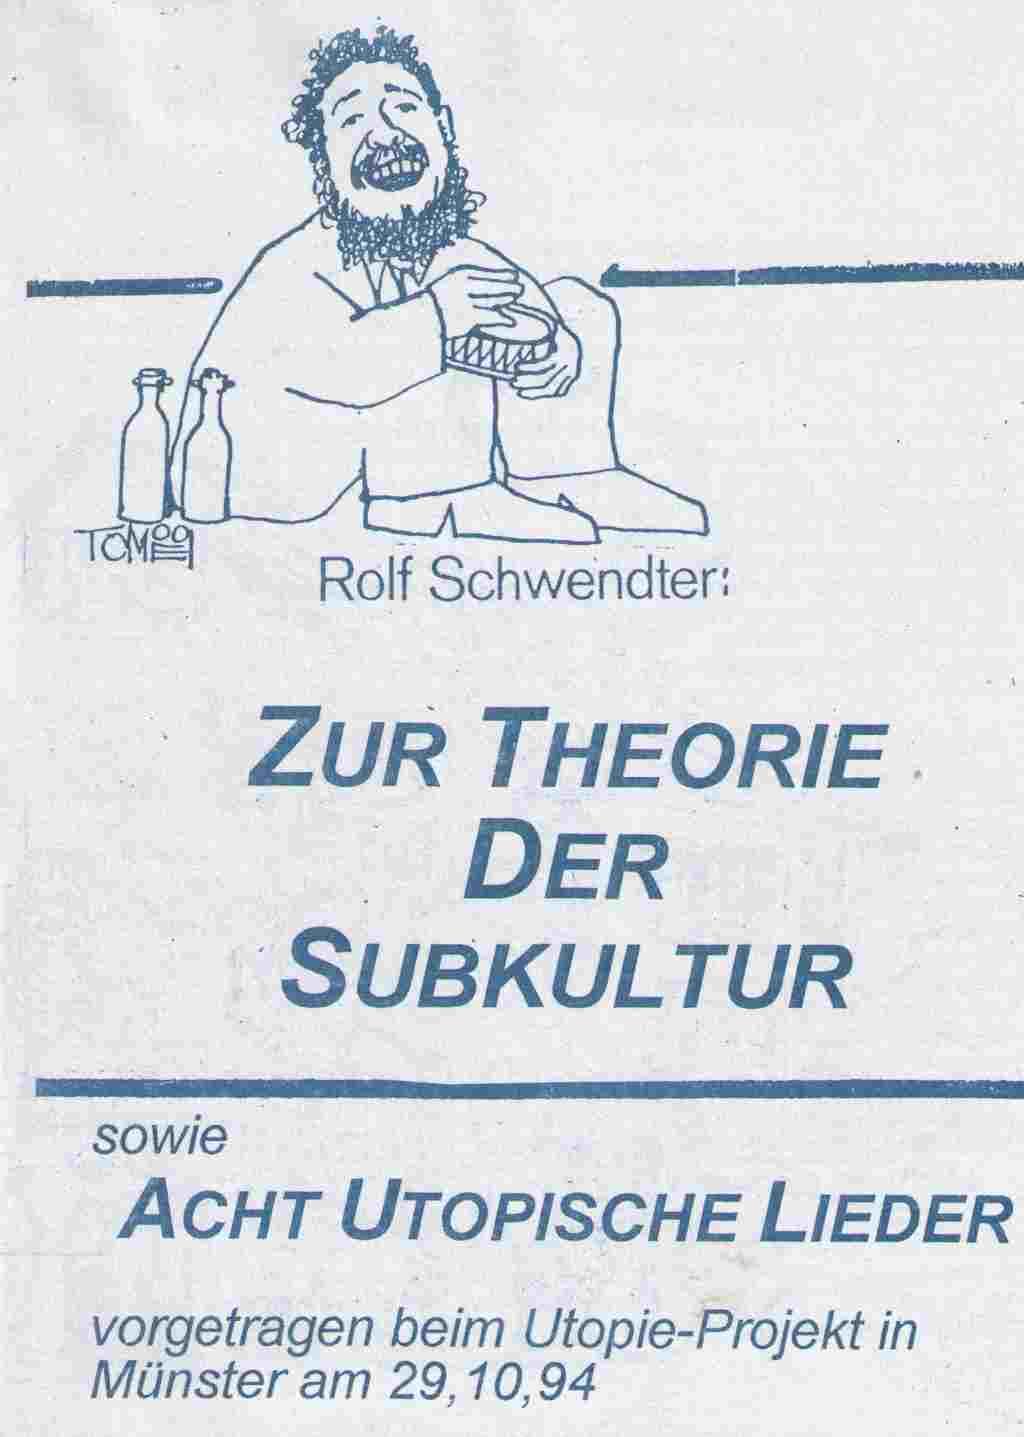 Schwendter Subkultur